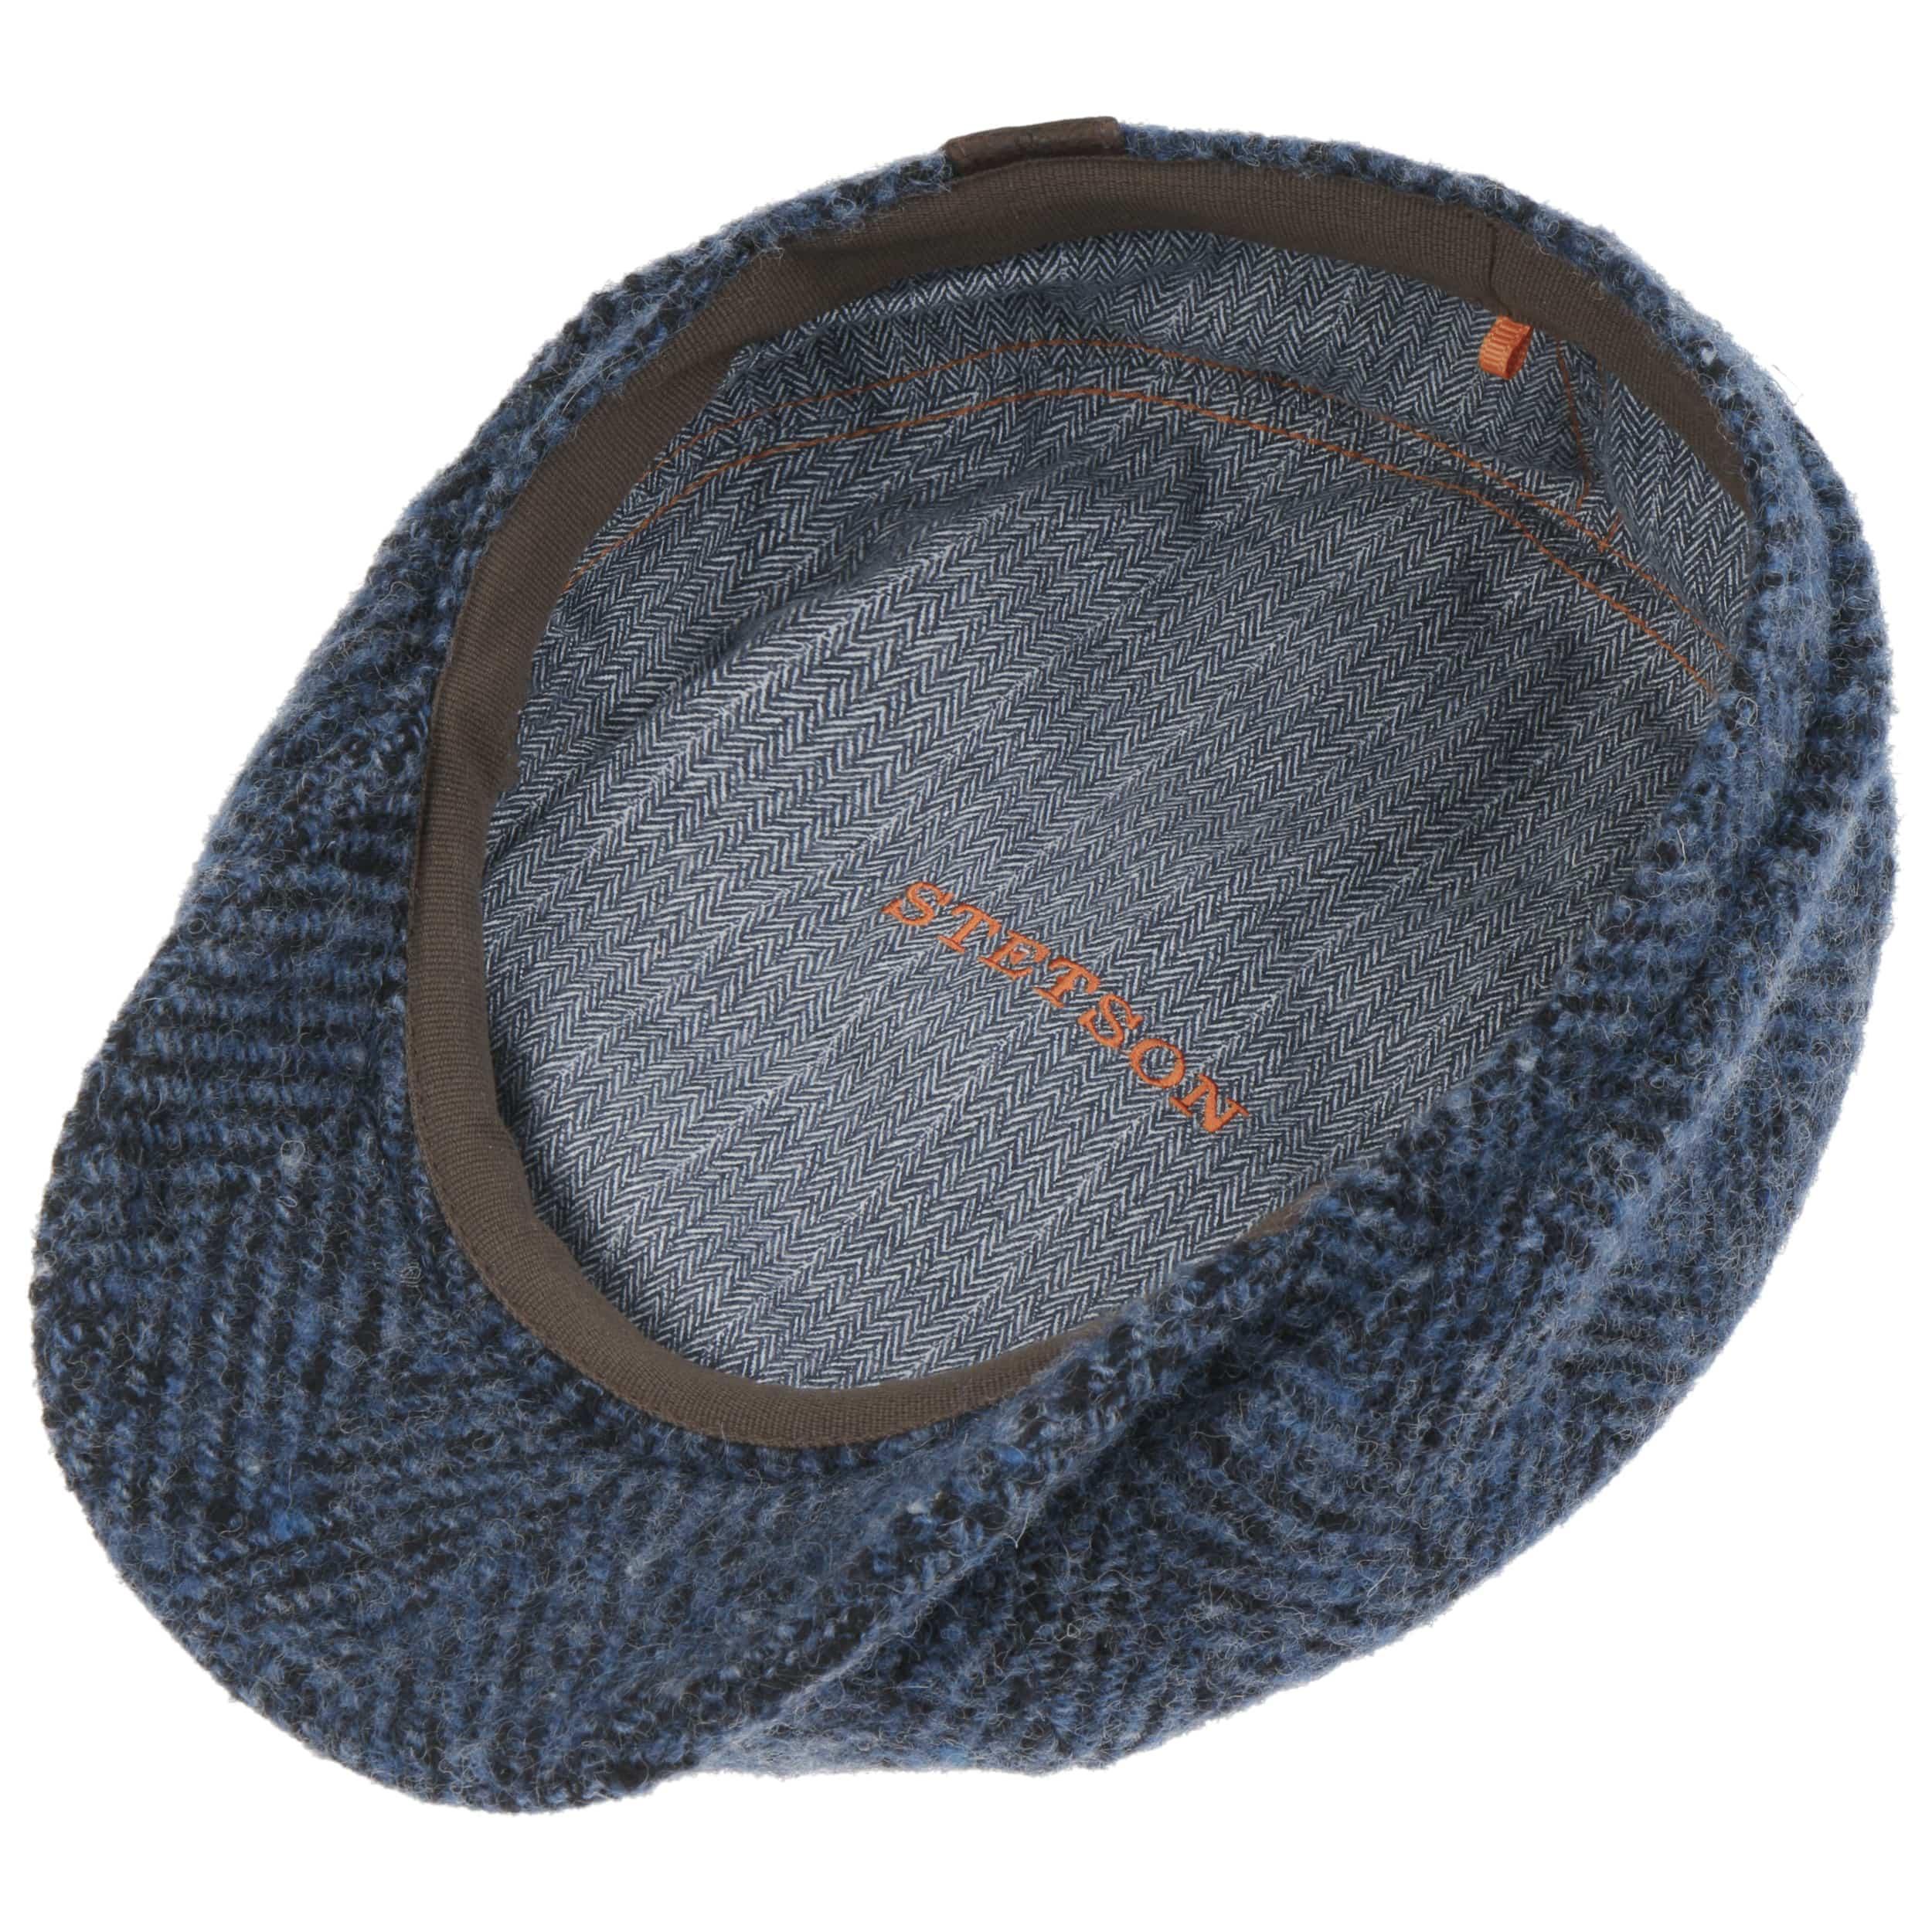 STETSON HATTERAS DONEGAL Flatcap Cap Mütze Schiebermütze Wintermütze Hut 433 NEU